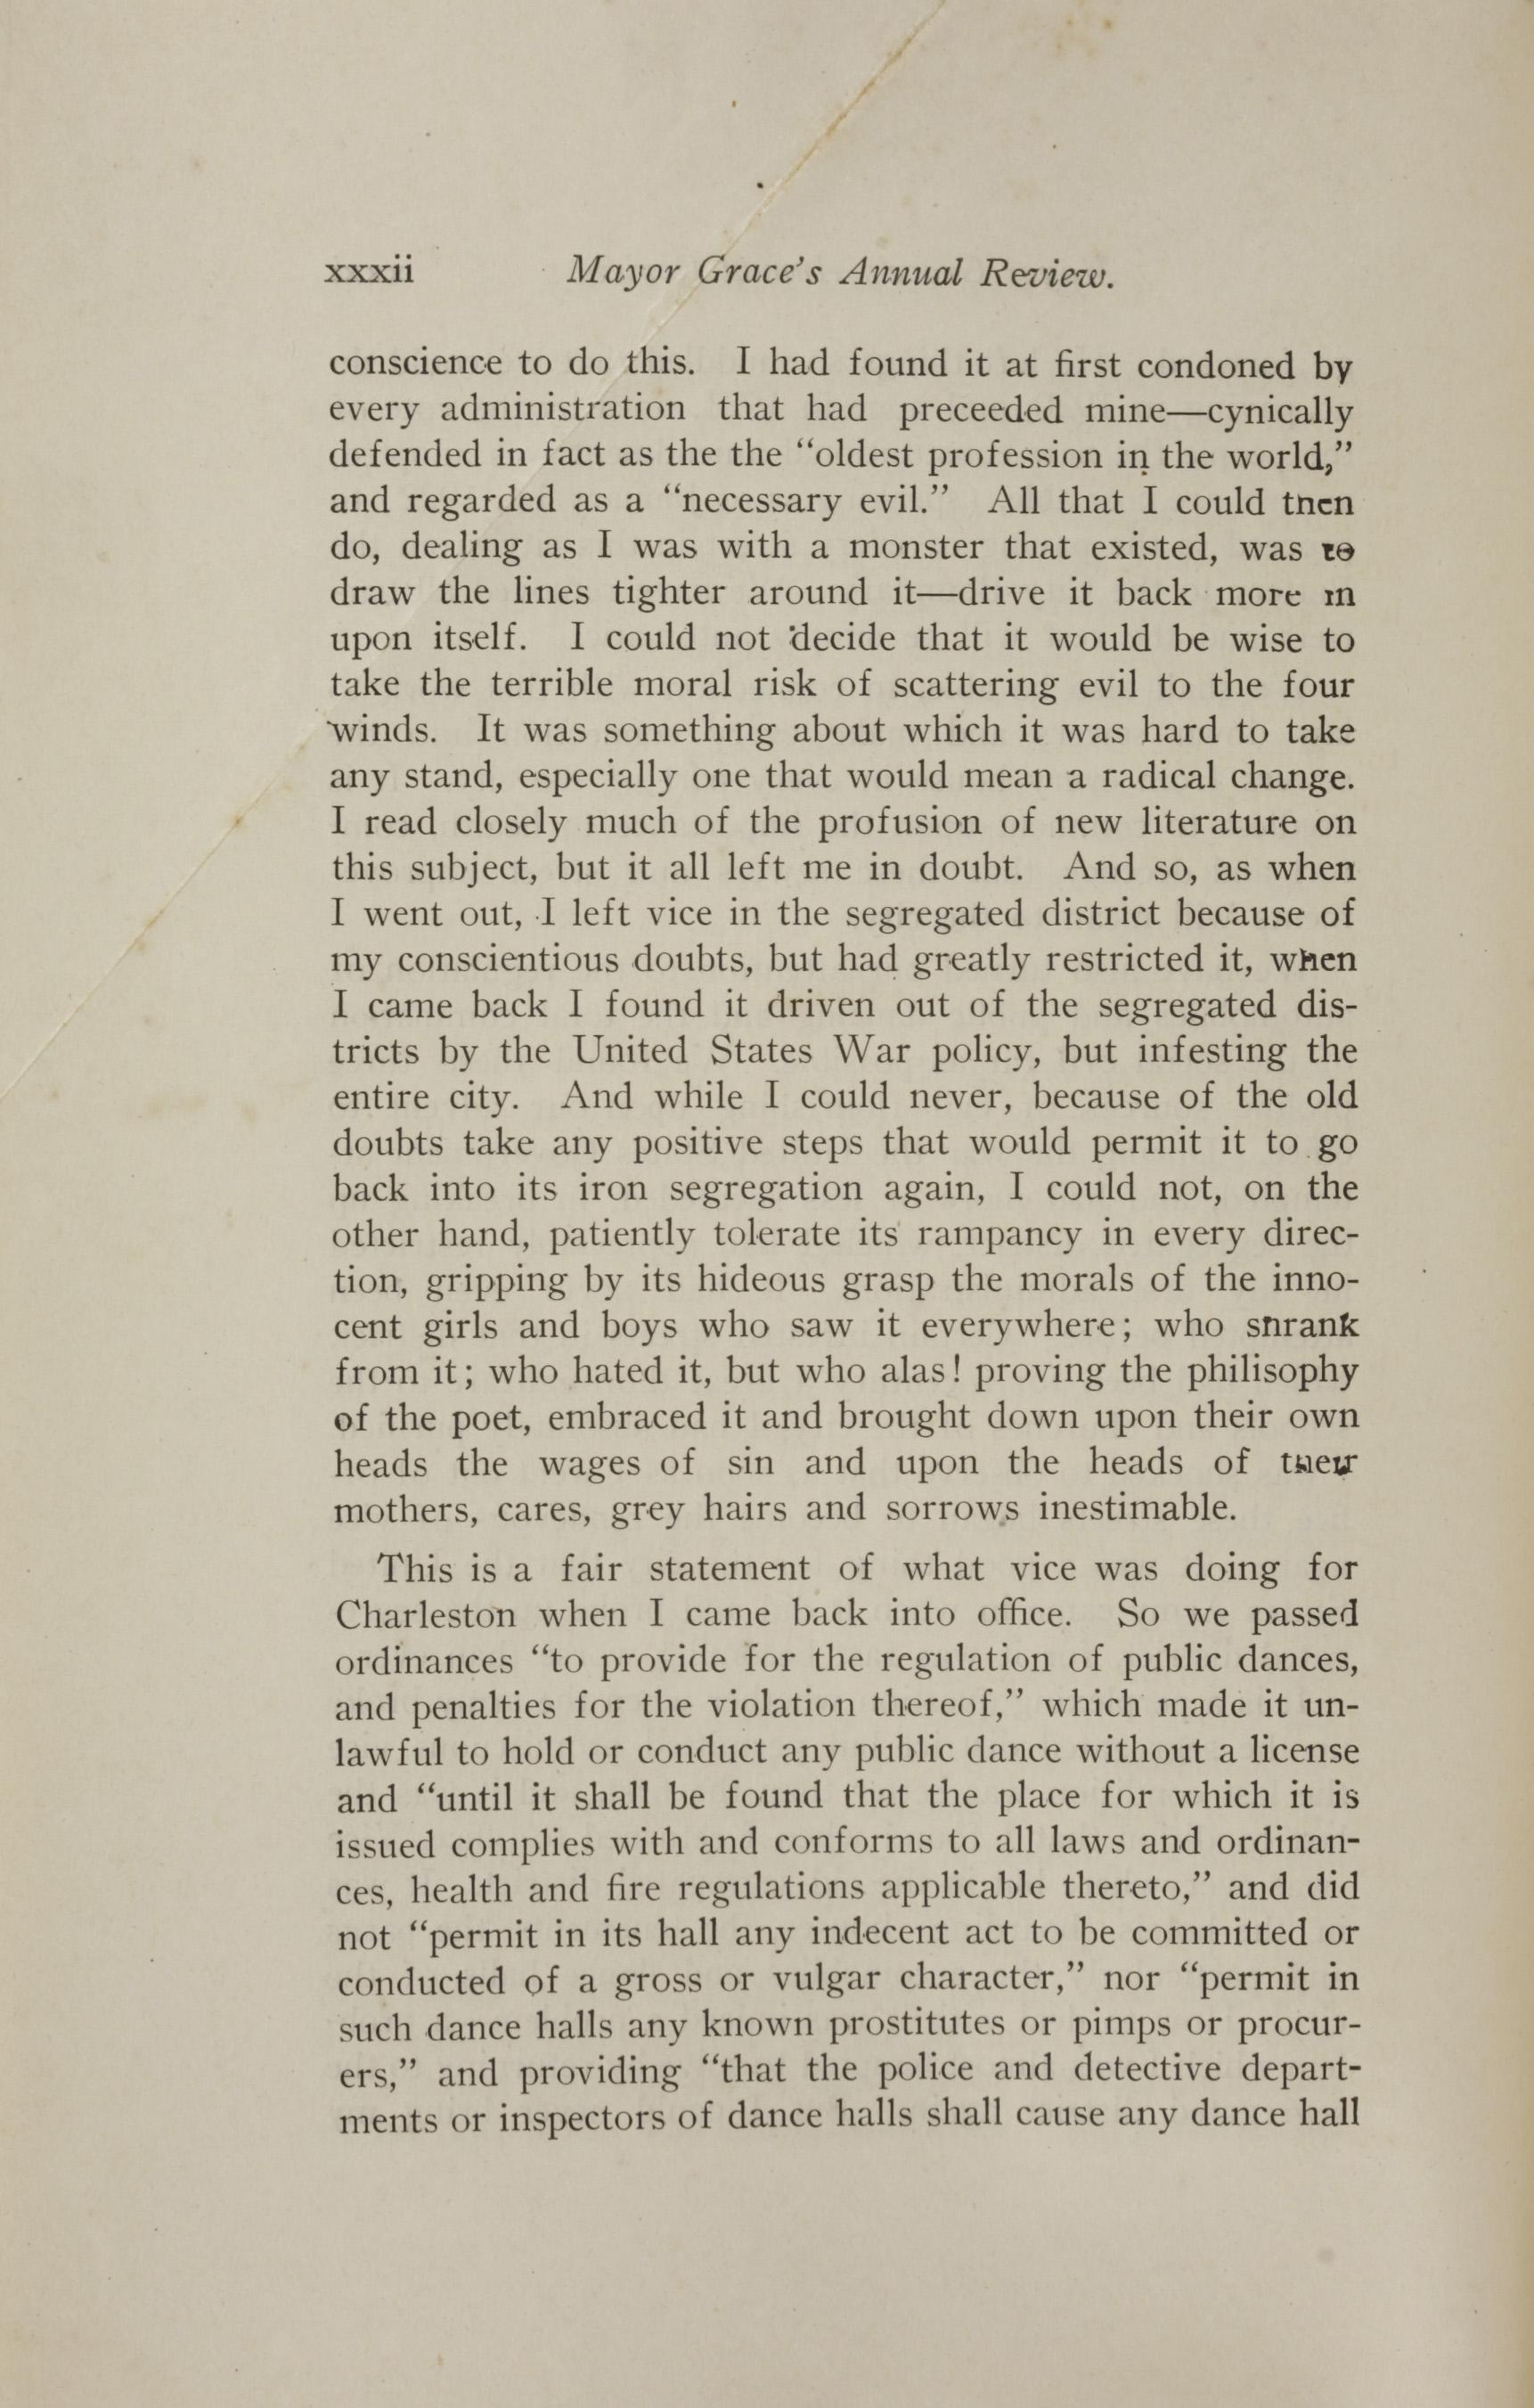 Charleston Yearbook, 1921, page xxxii